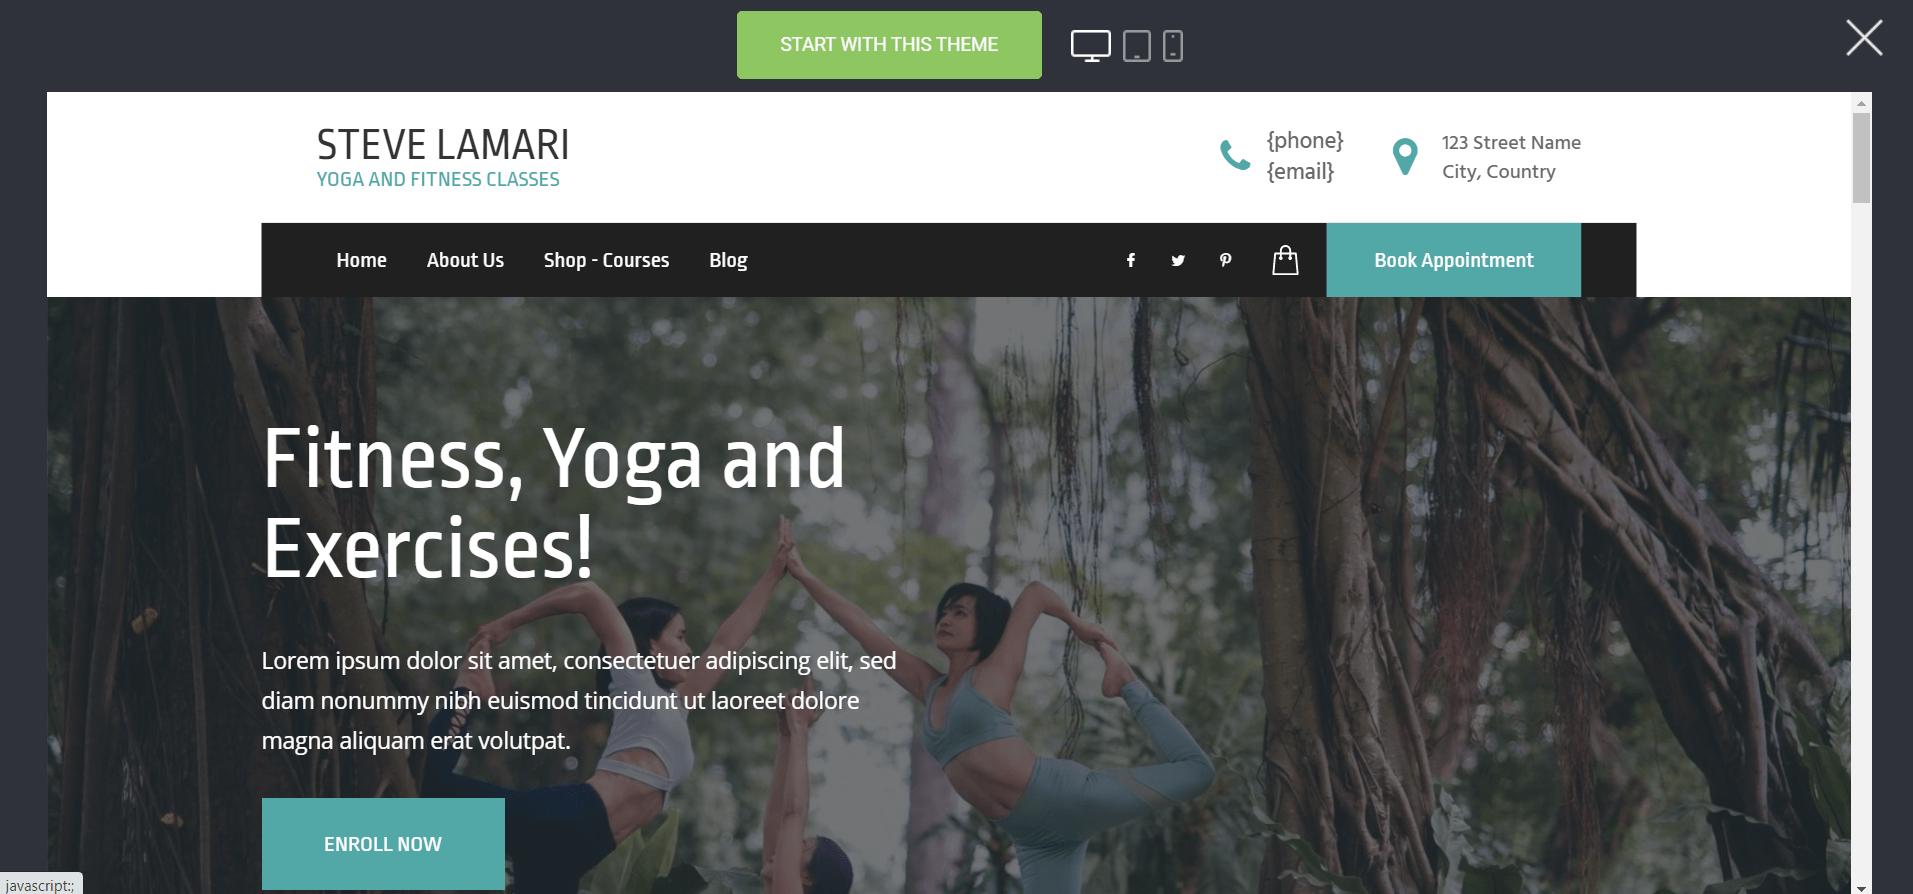 Webssly: Yoga website theme